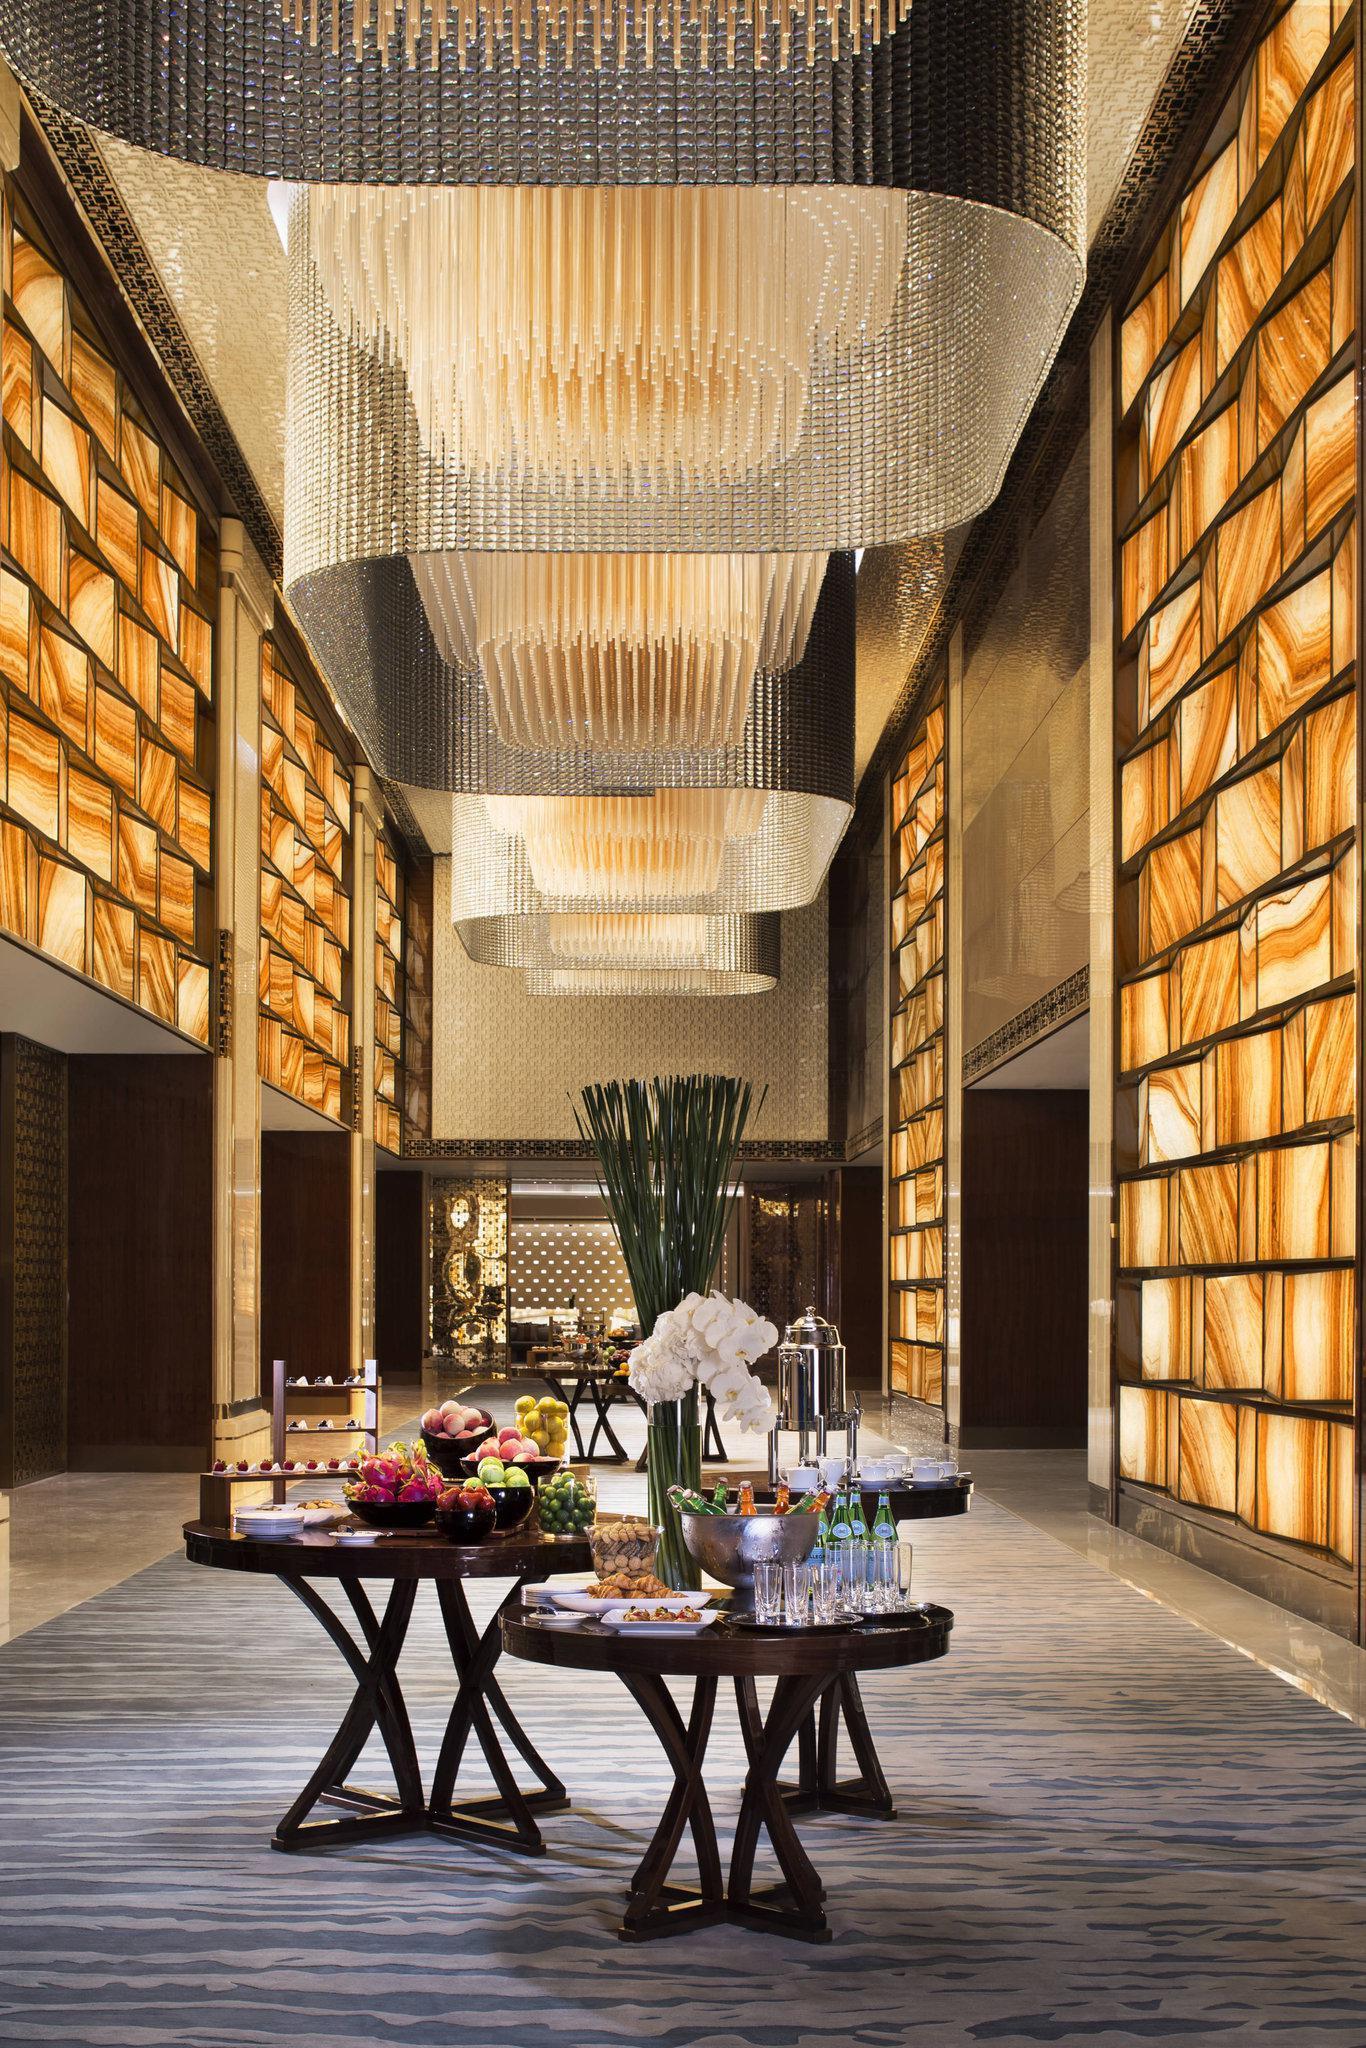 Outstanding lighting modern ideas to decor Hotel Lobby